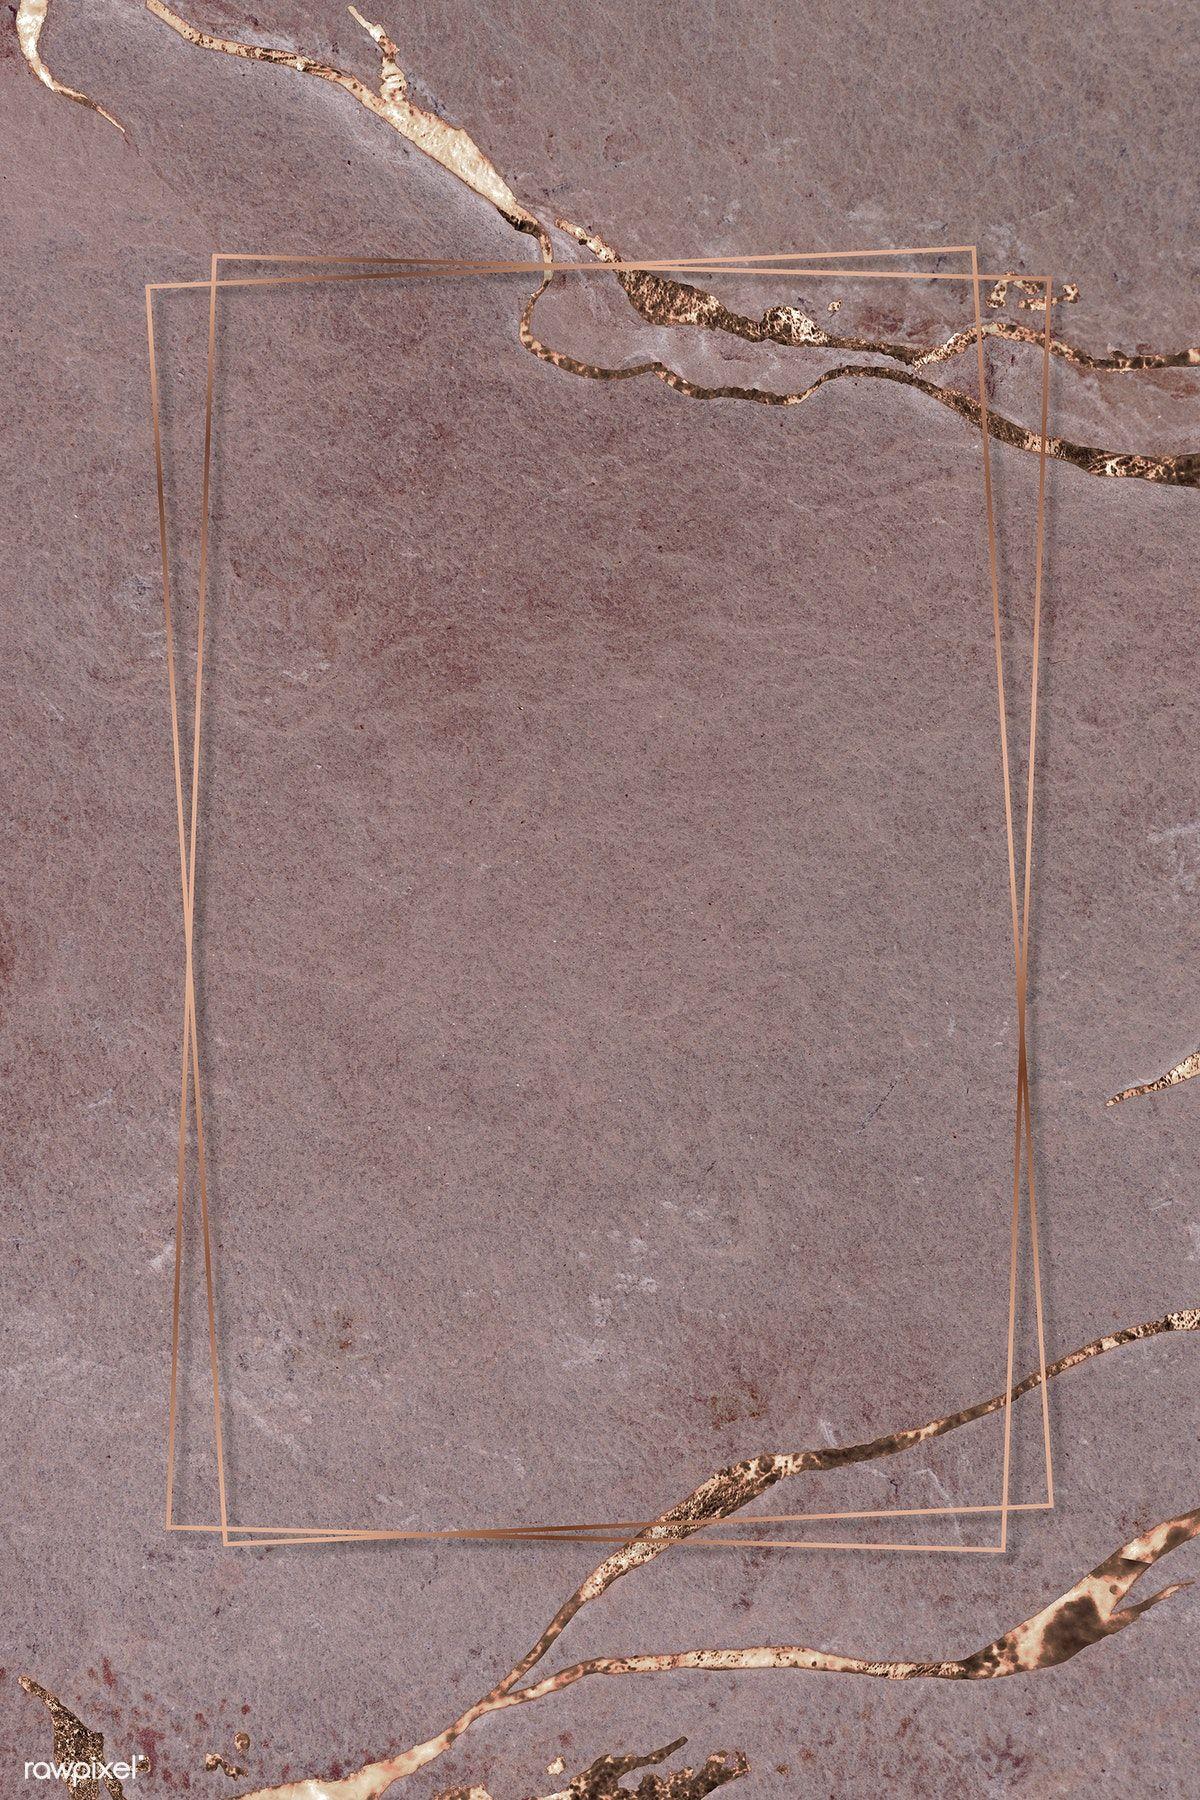 Download premium psd of Reddish brown marble textured background